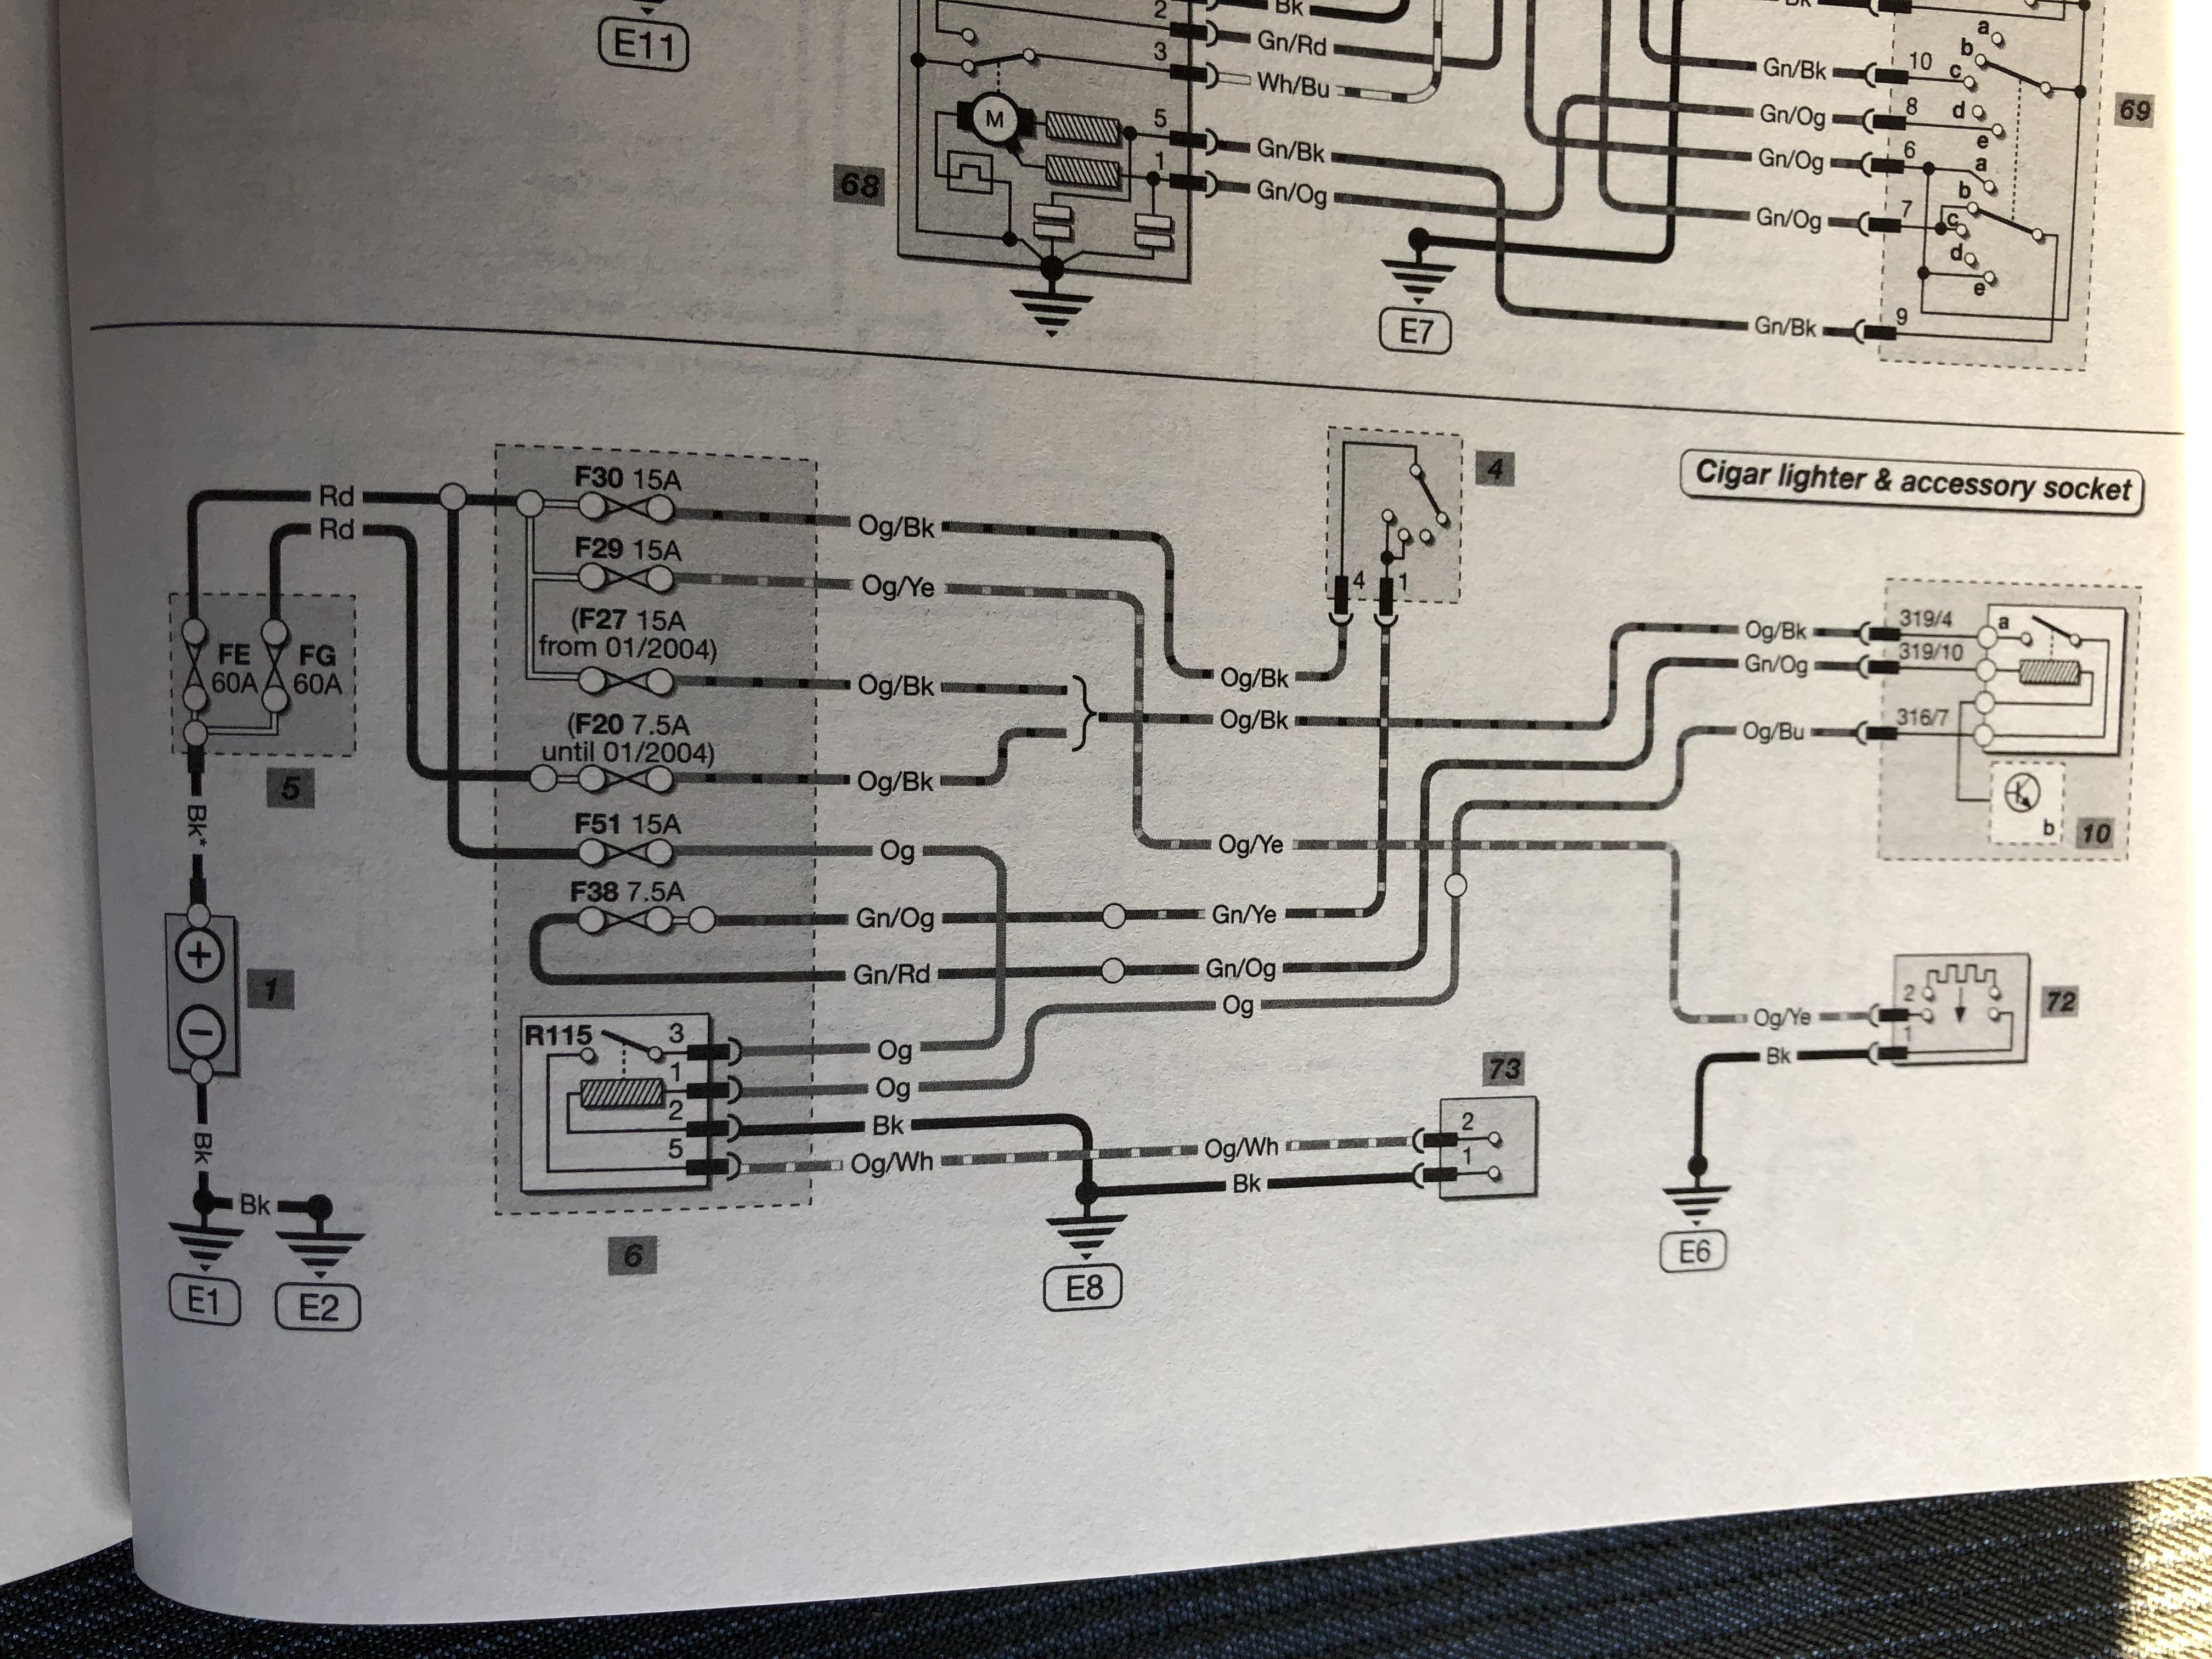 [SCHEMATICS_4LK]  MK6 Cigarette lighter wiring - Ford Fiesta Club - Ford Owners Club - Ford  Forums | Ford Puma Wiring Diagram |  | Ford Owners Club